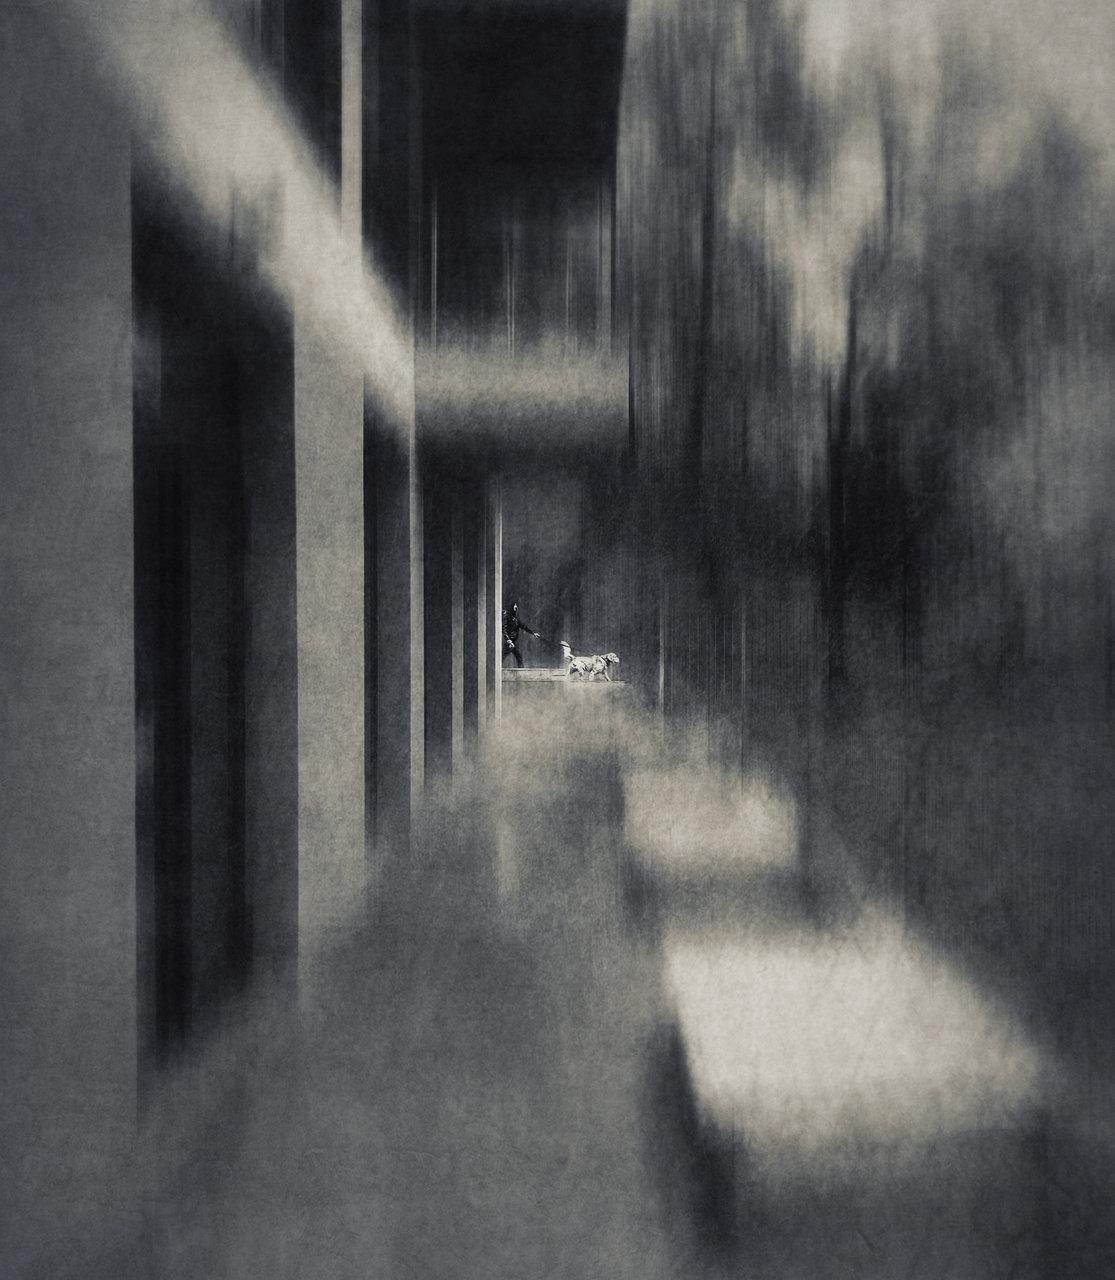 Photo in Everything else   Author Ilina Taneva - Инка   PHOTO FORUM